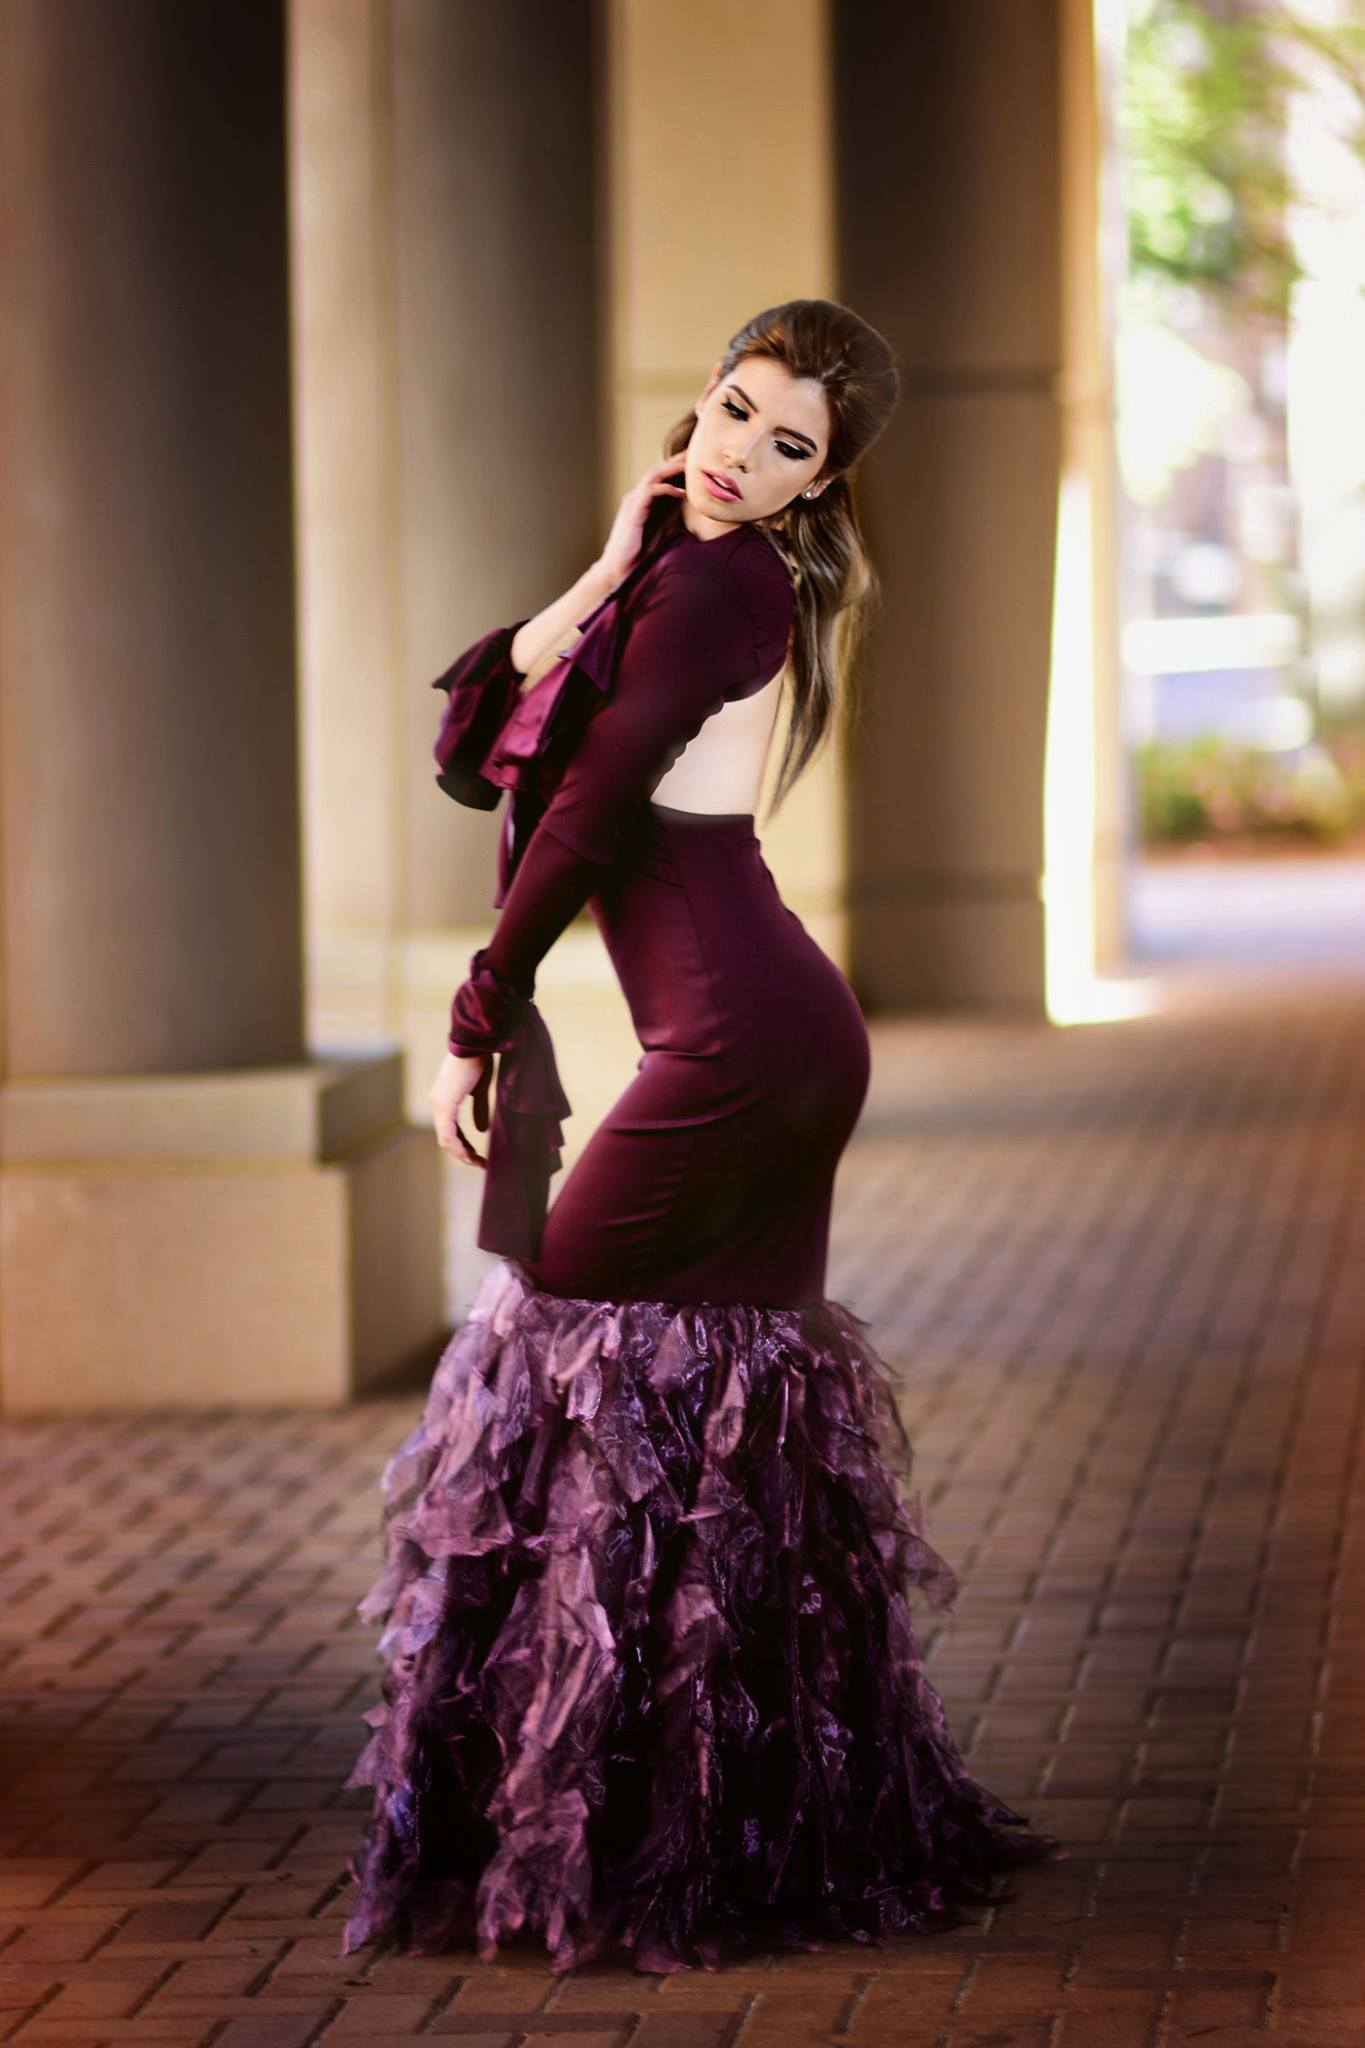 Photographer: Olivia Garcia  Model: Pamella Botero